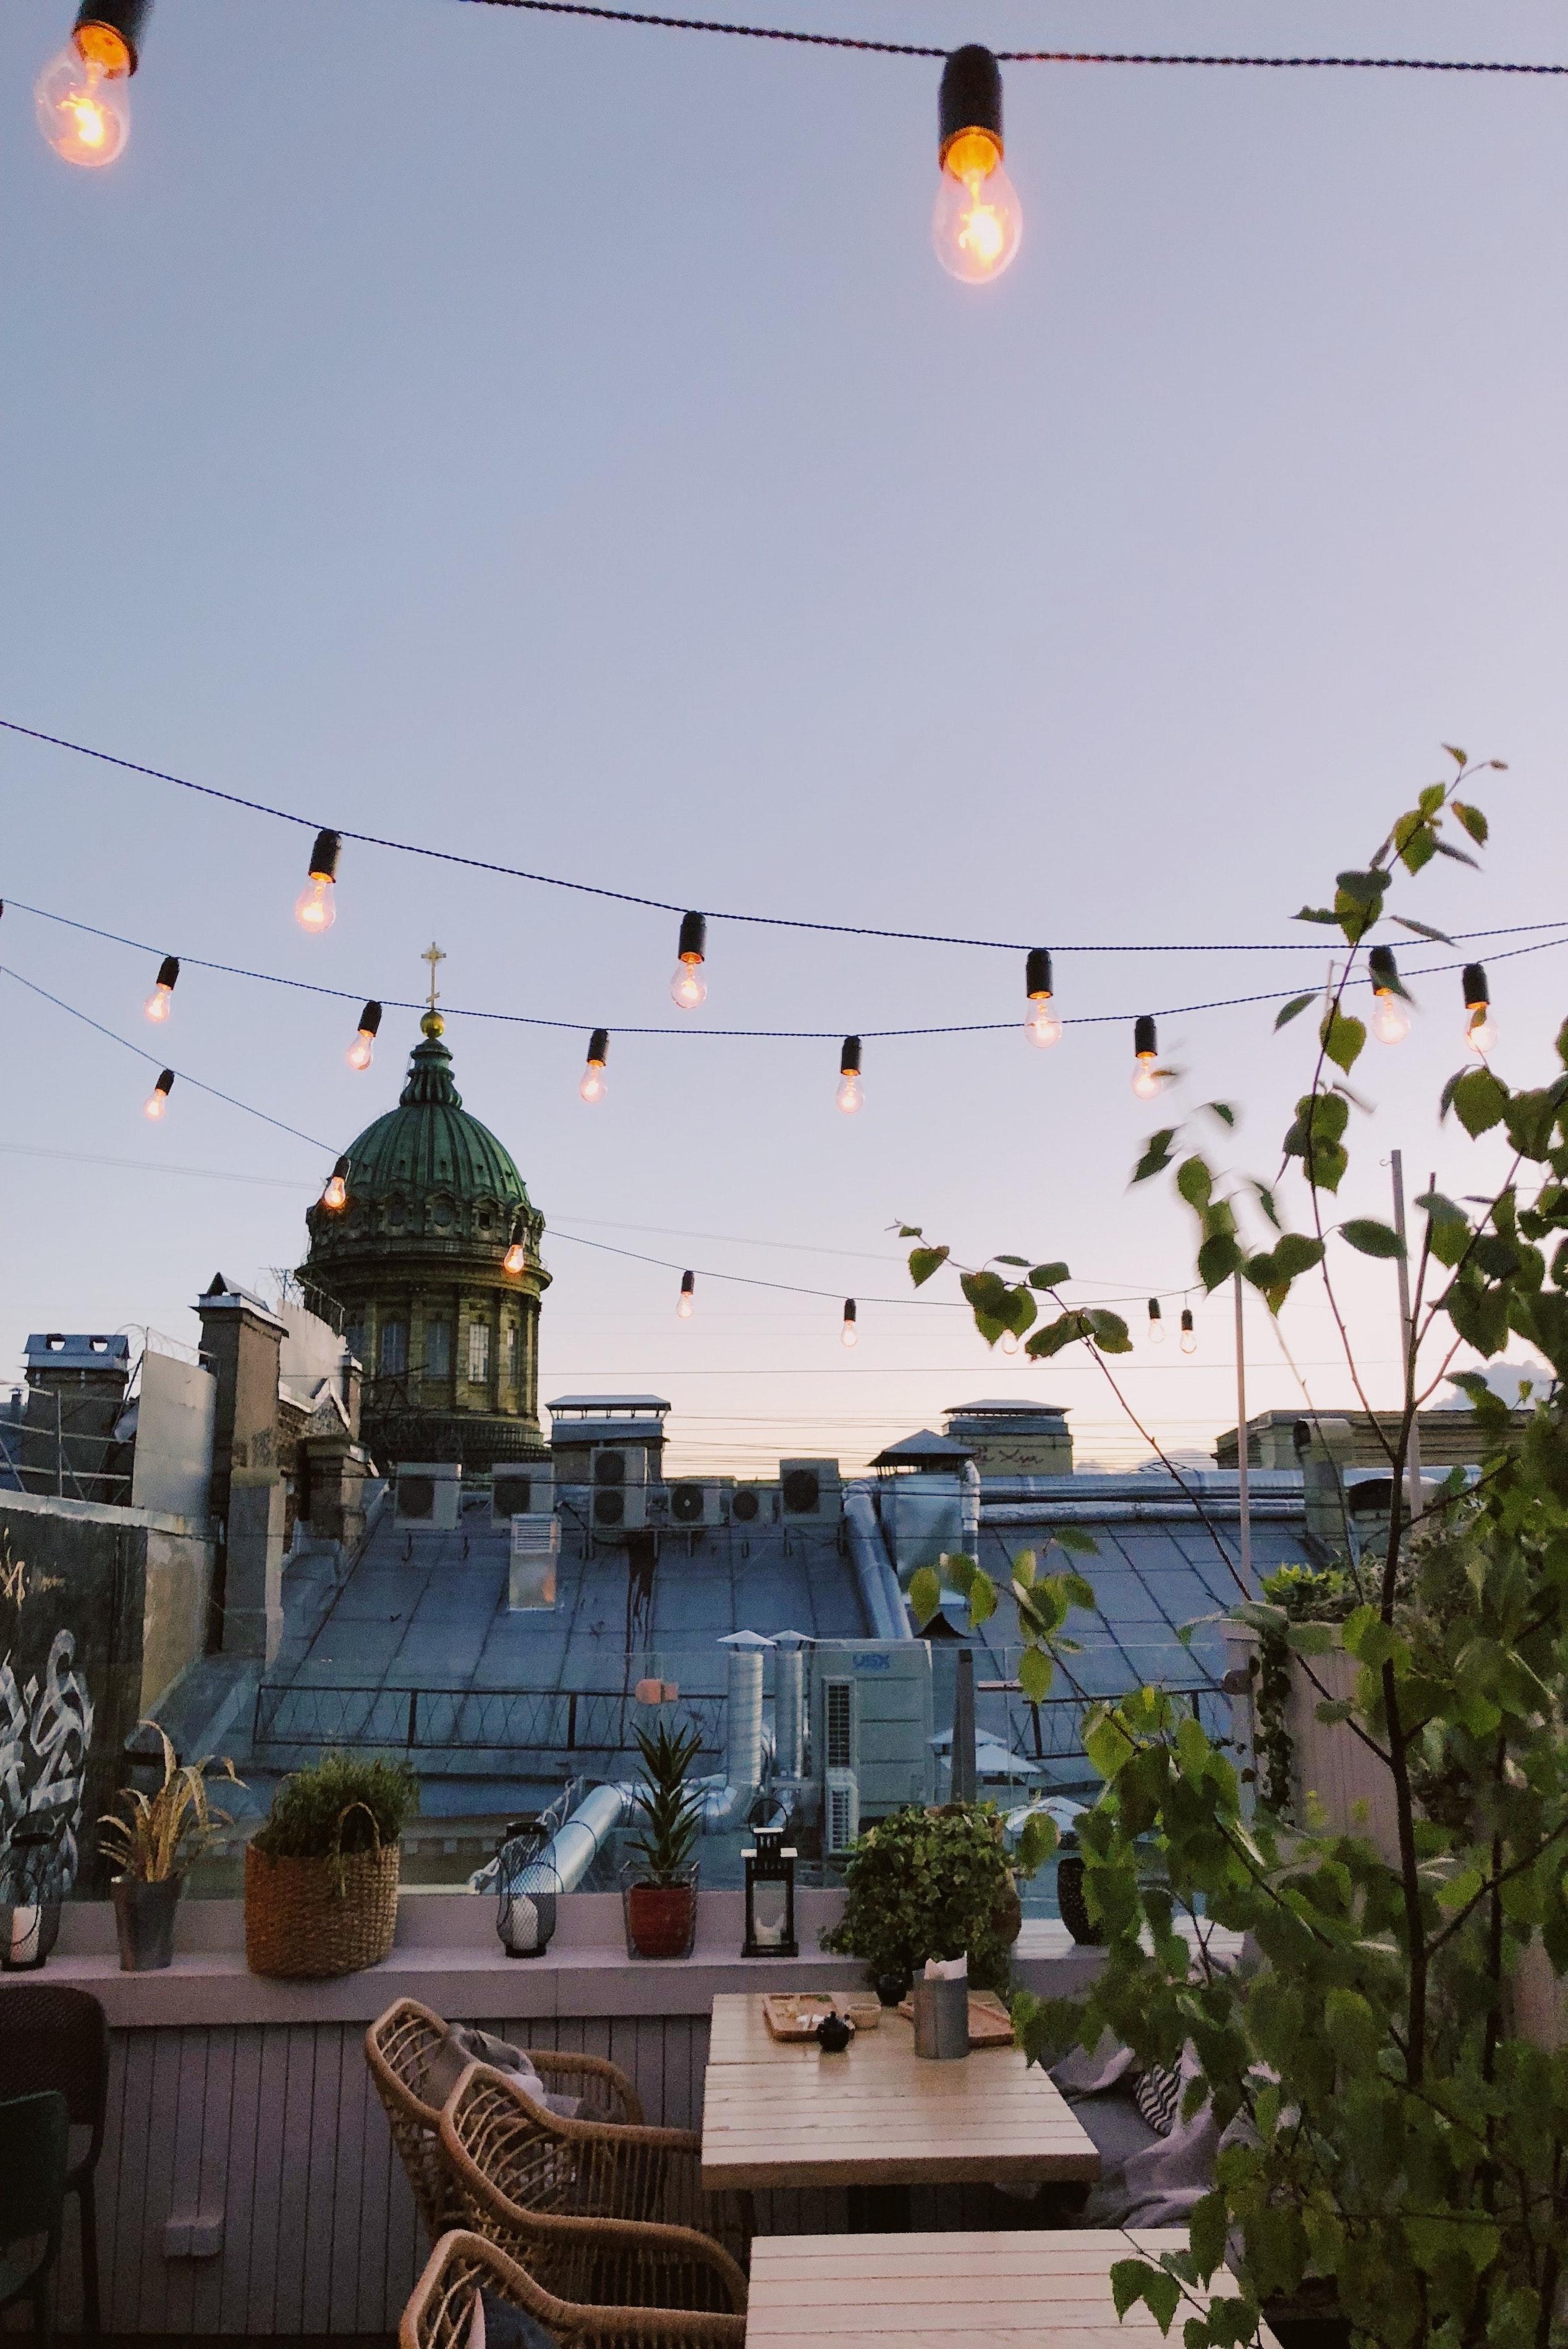 terrasse printemps avec guirlande lumineuse